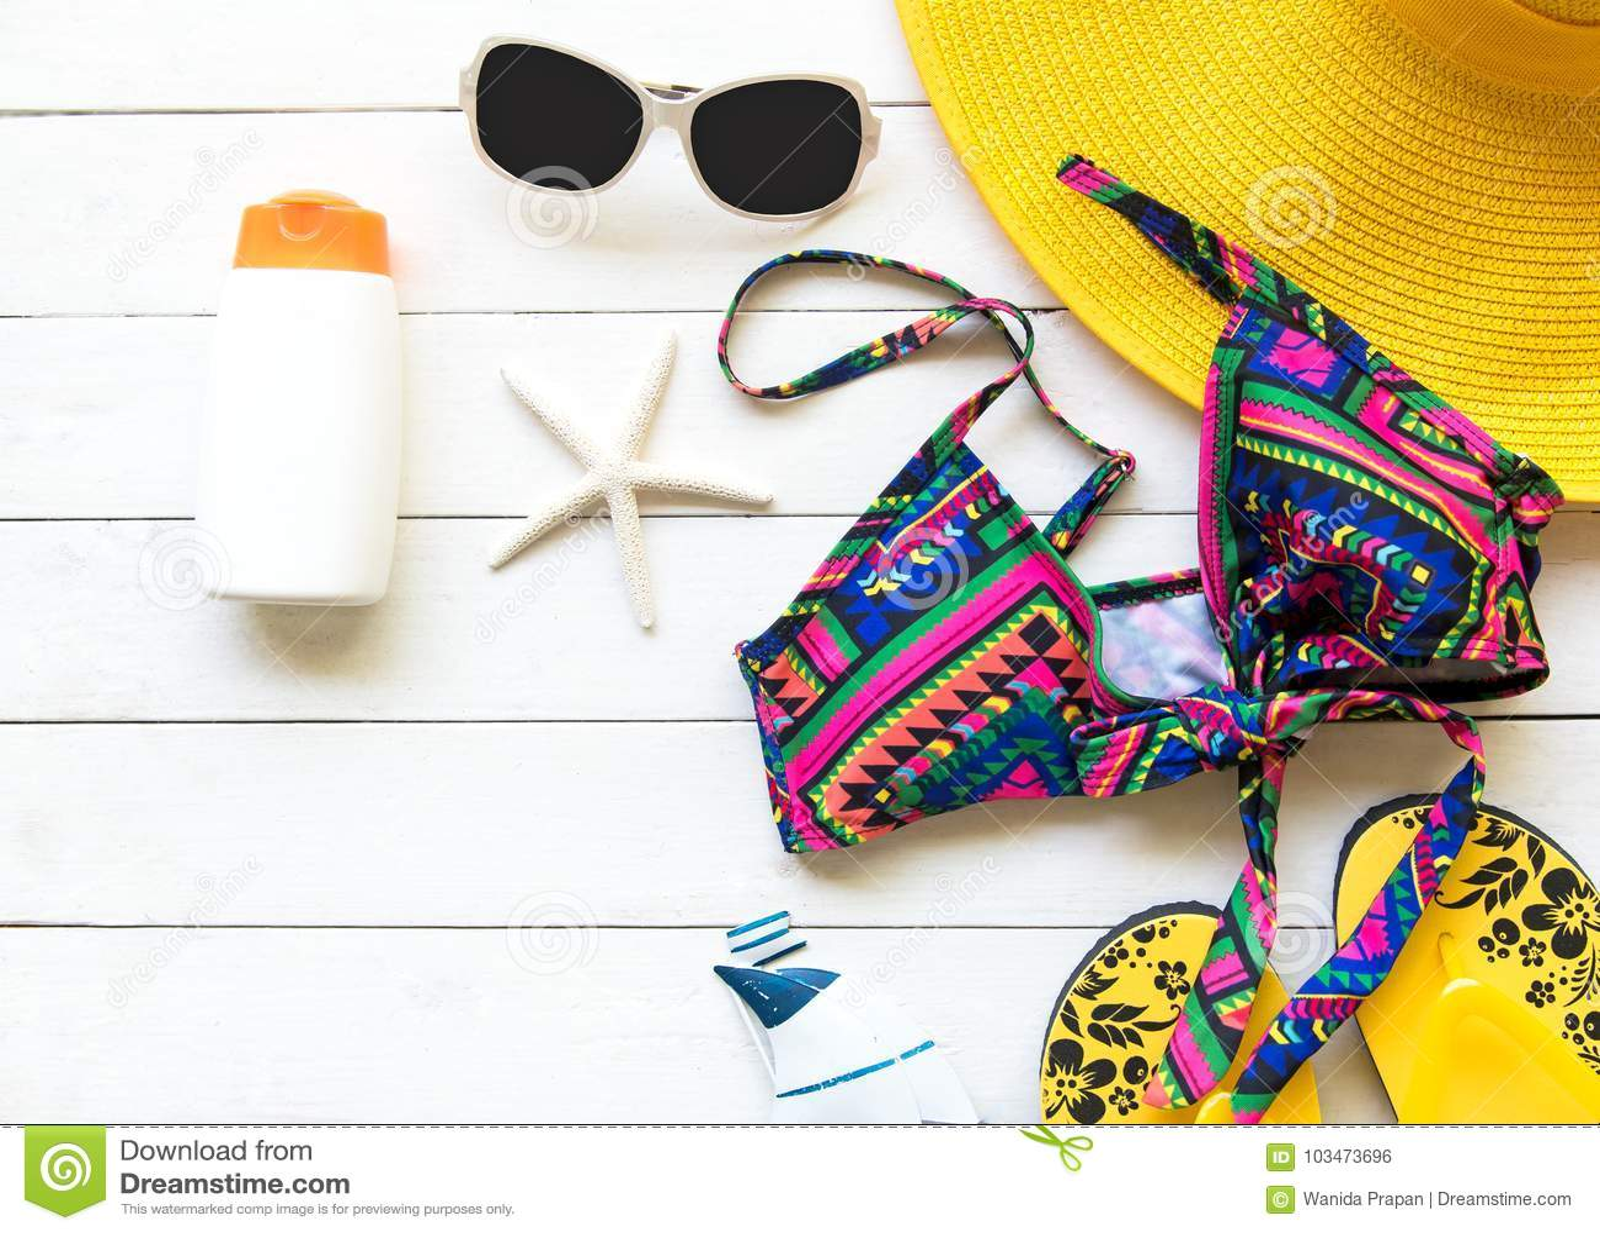 a26dd9f7f9 Κίτρινα μεγάλα καπέλο και εξαρτήματα γυναικών θερινής μόδας στην παραλία  θάλασσα τροπική Ασυνήθιστη τοπ άποψη